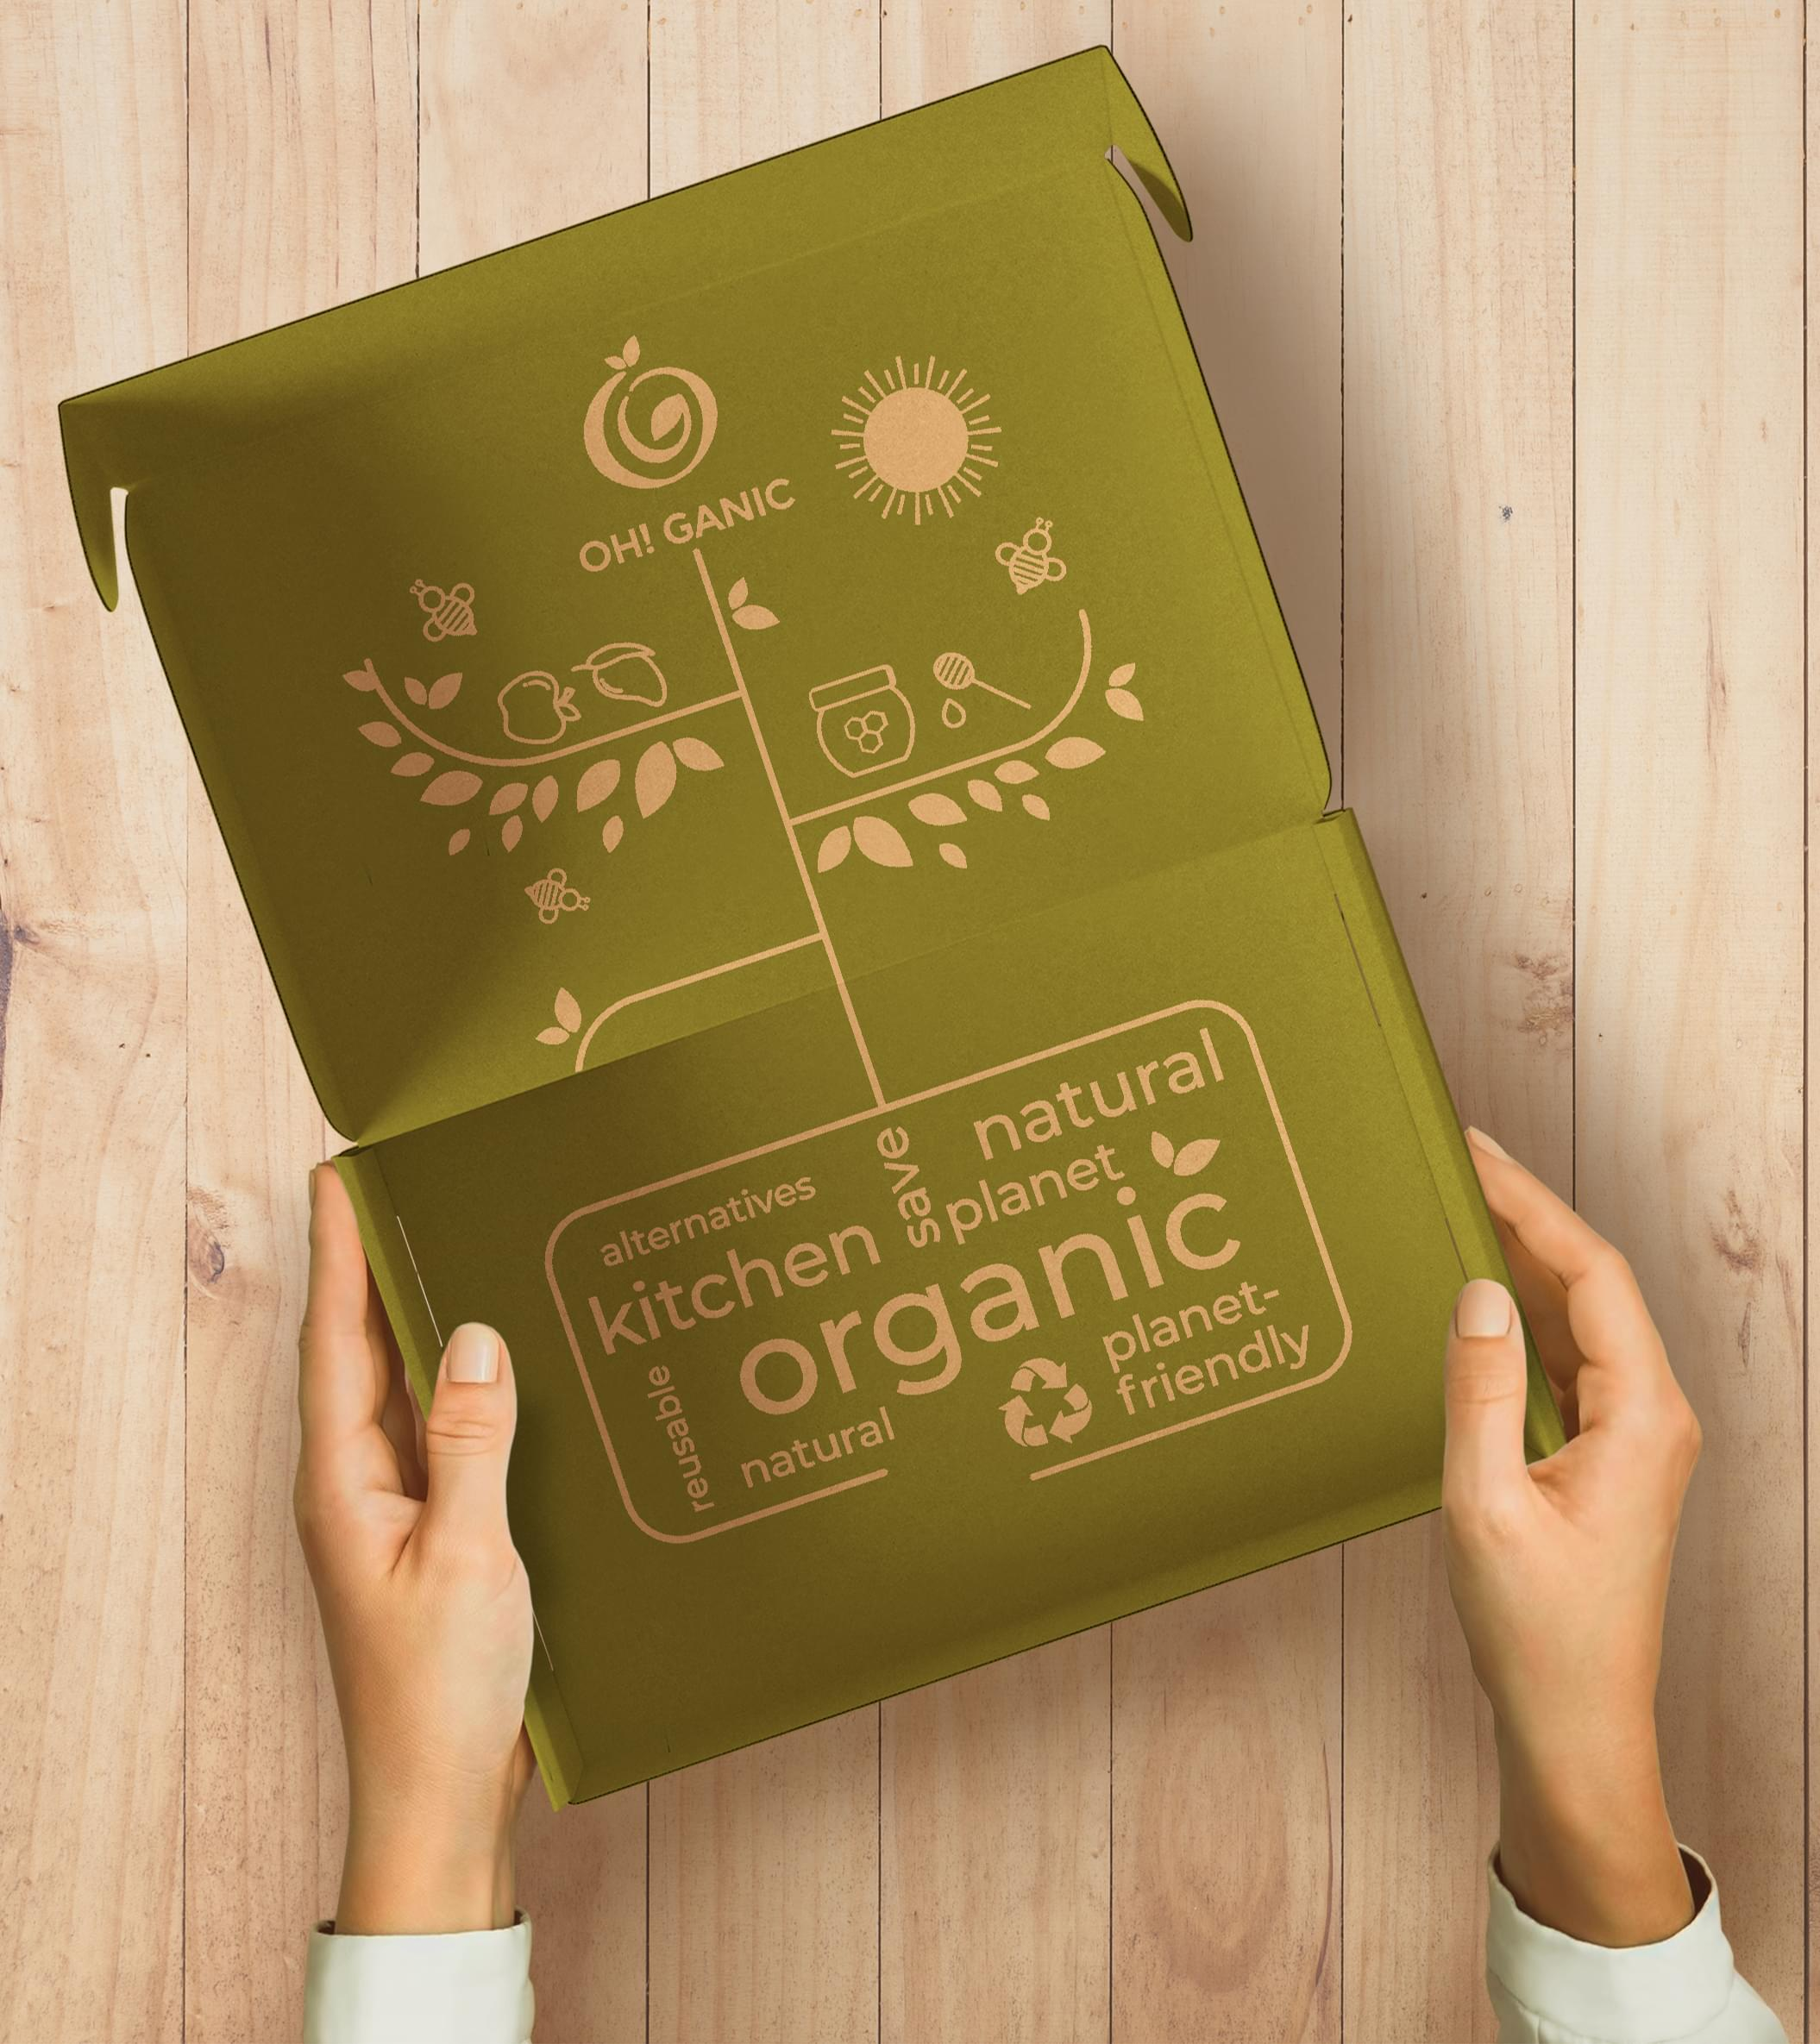 OH! GANIC Packaging